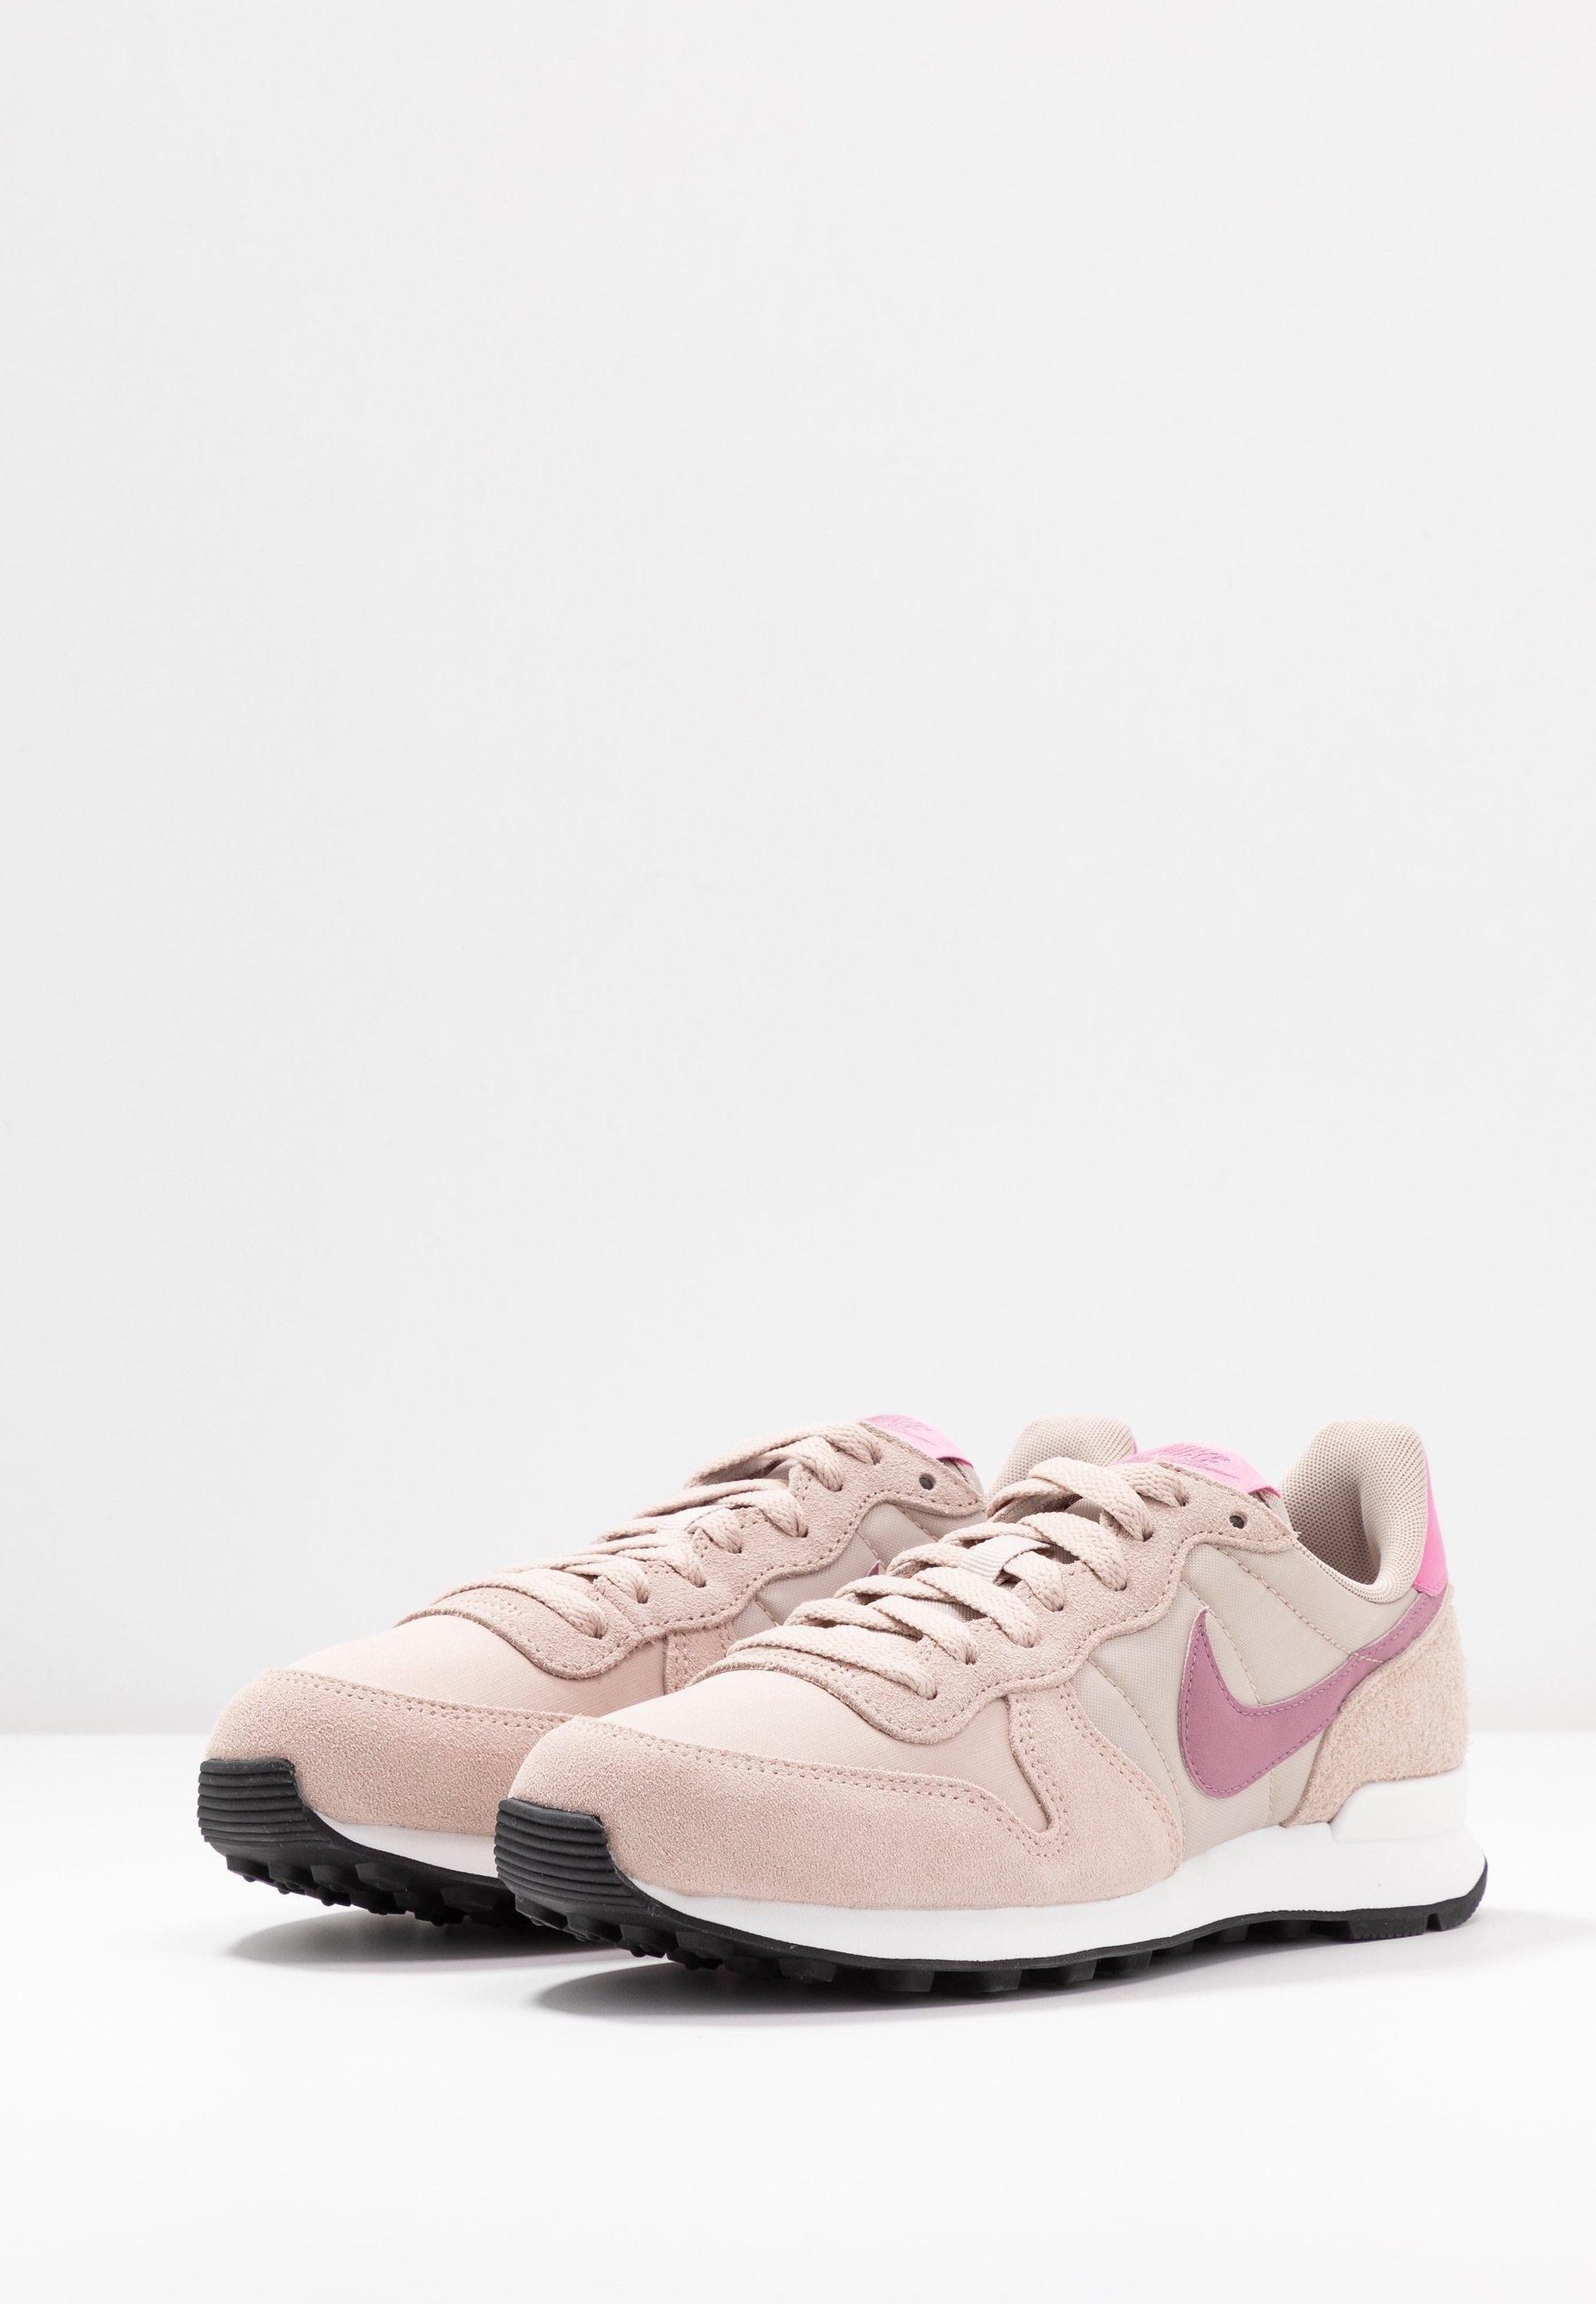 nike internationalist rose,achat vente chaussures baskets